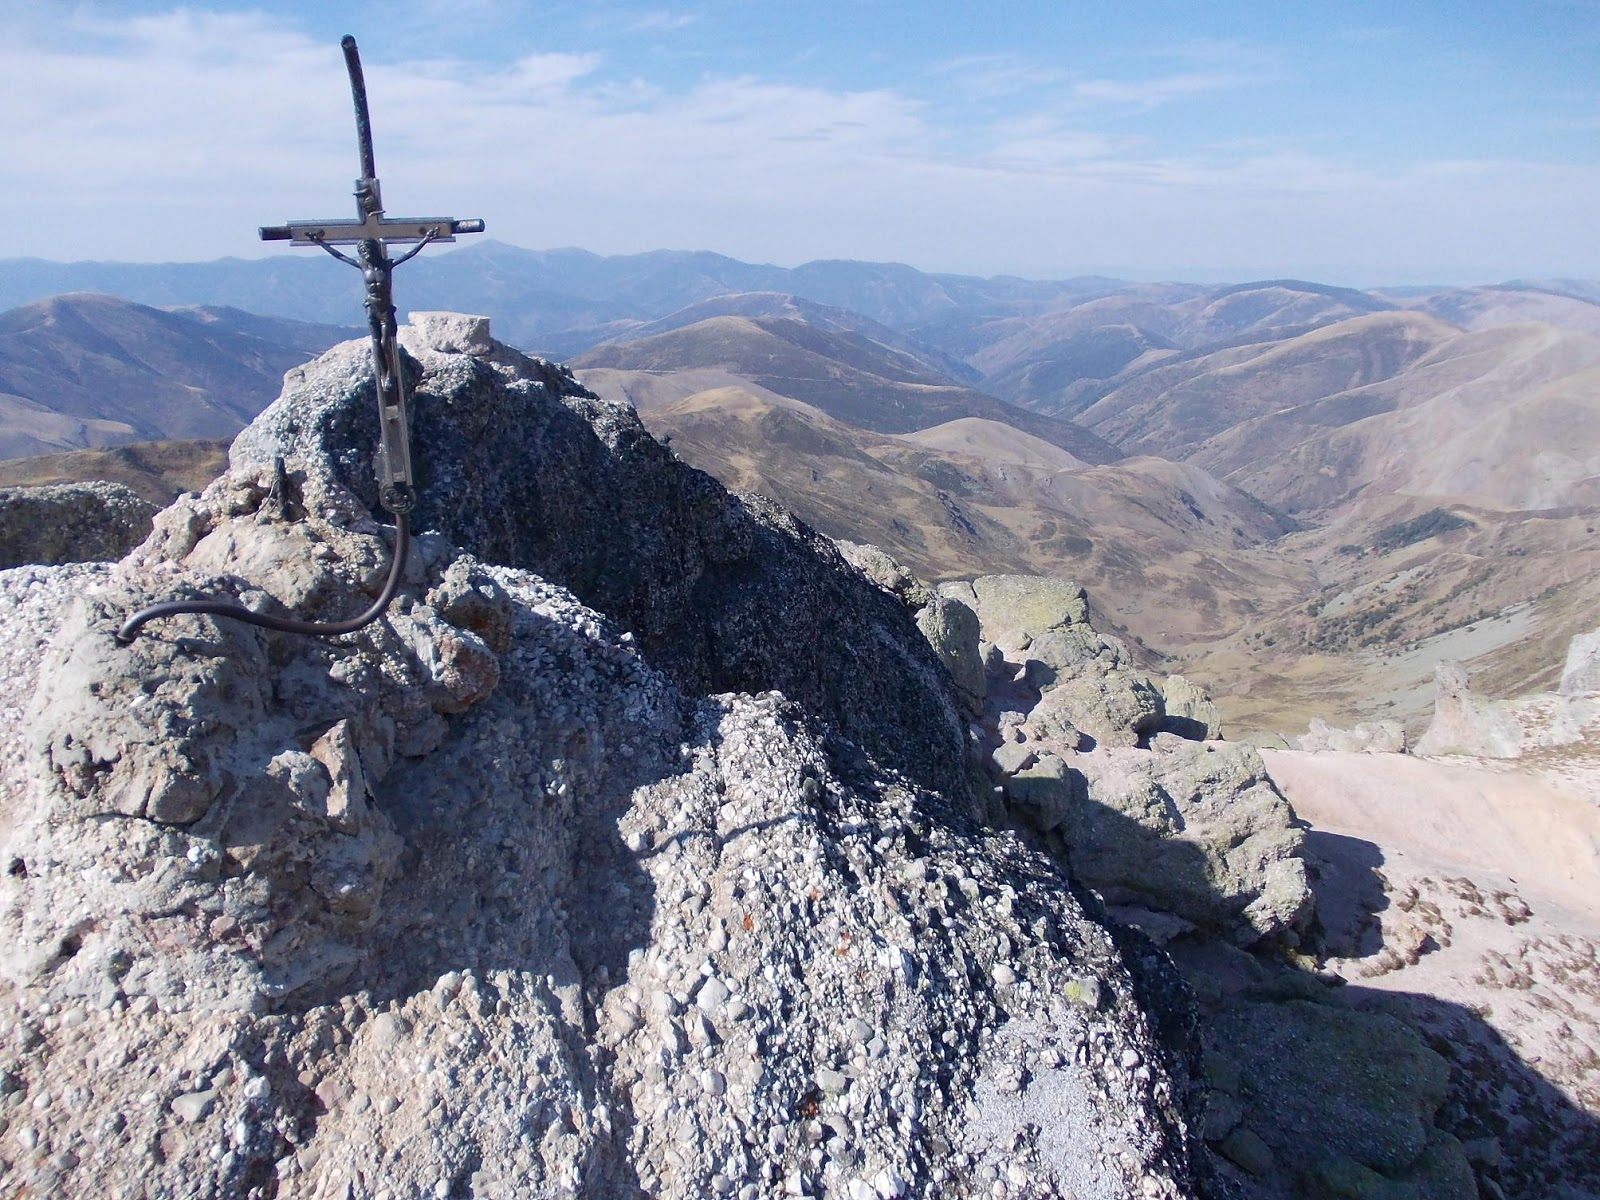 Senderismo en Urbión. Cima de Urbión